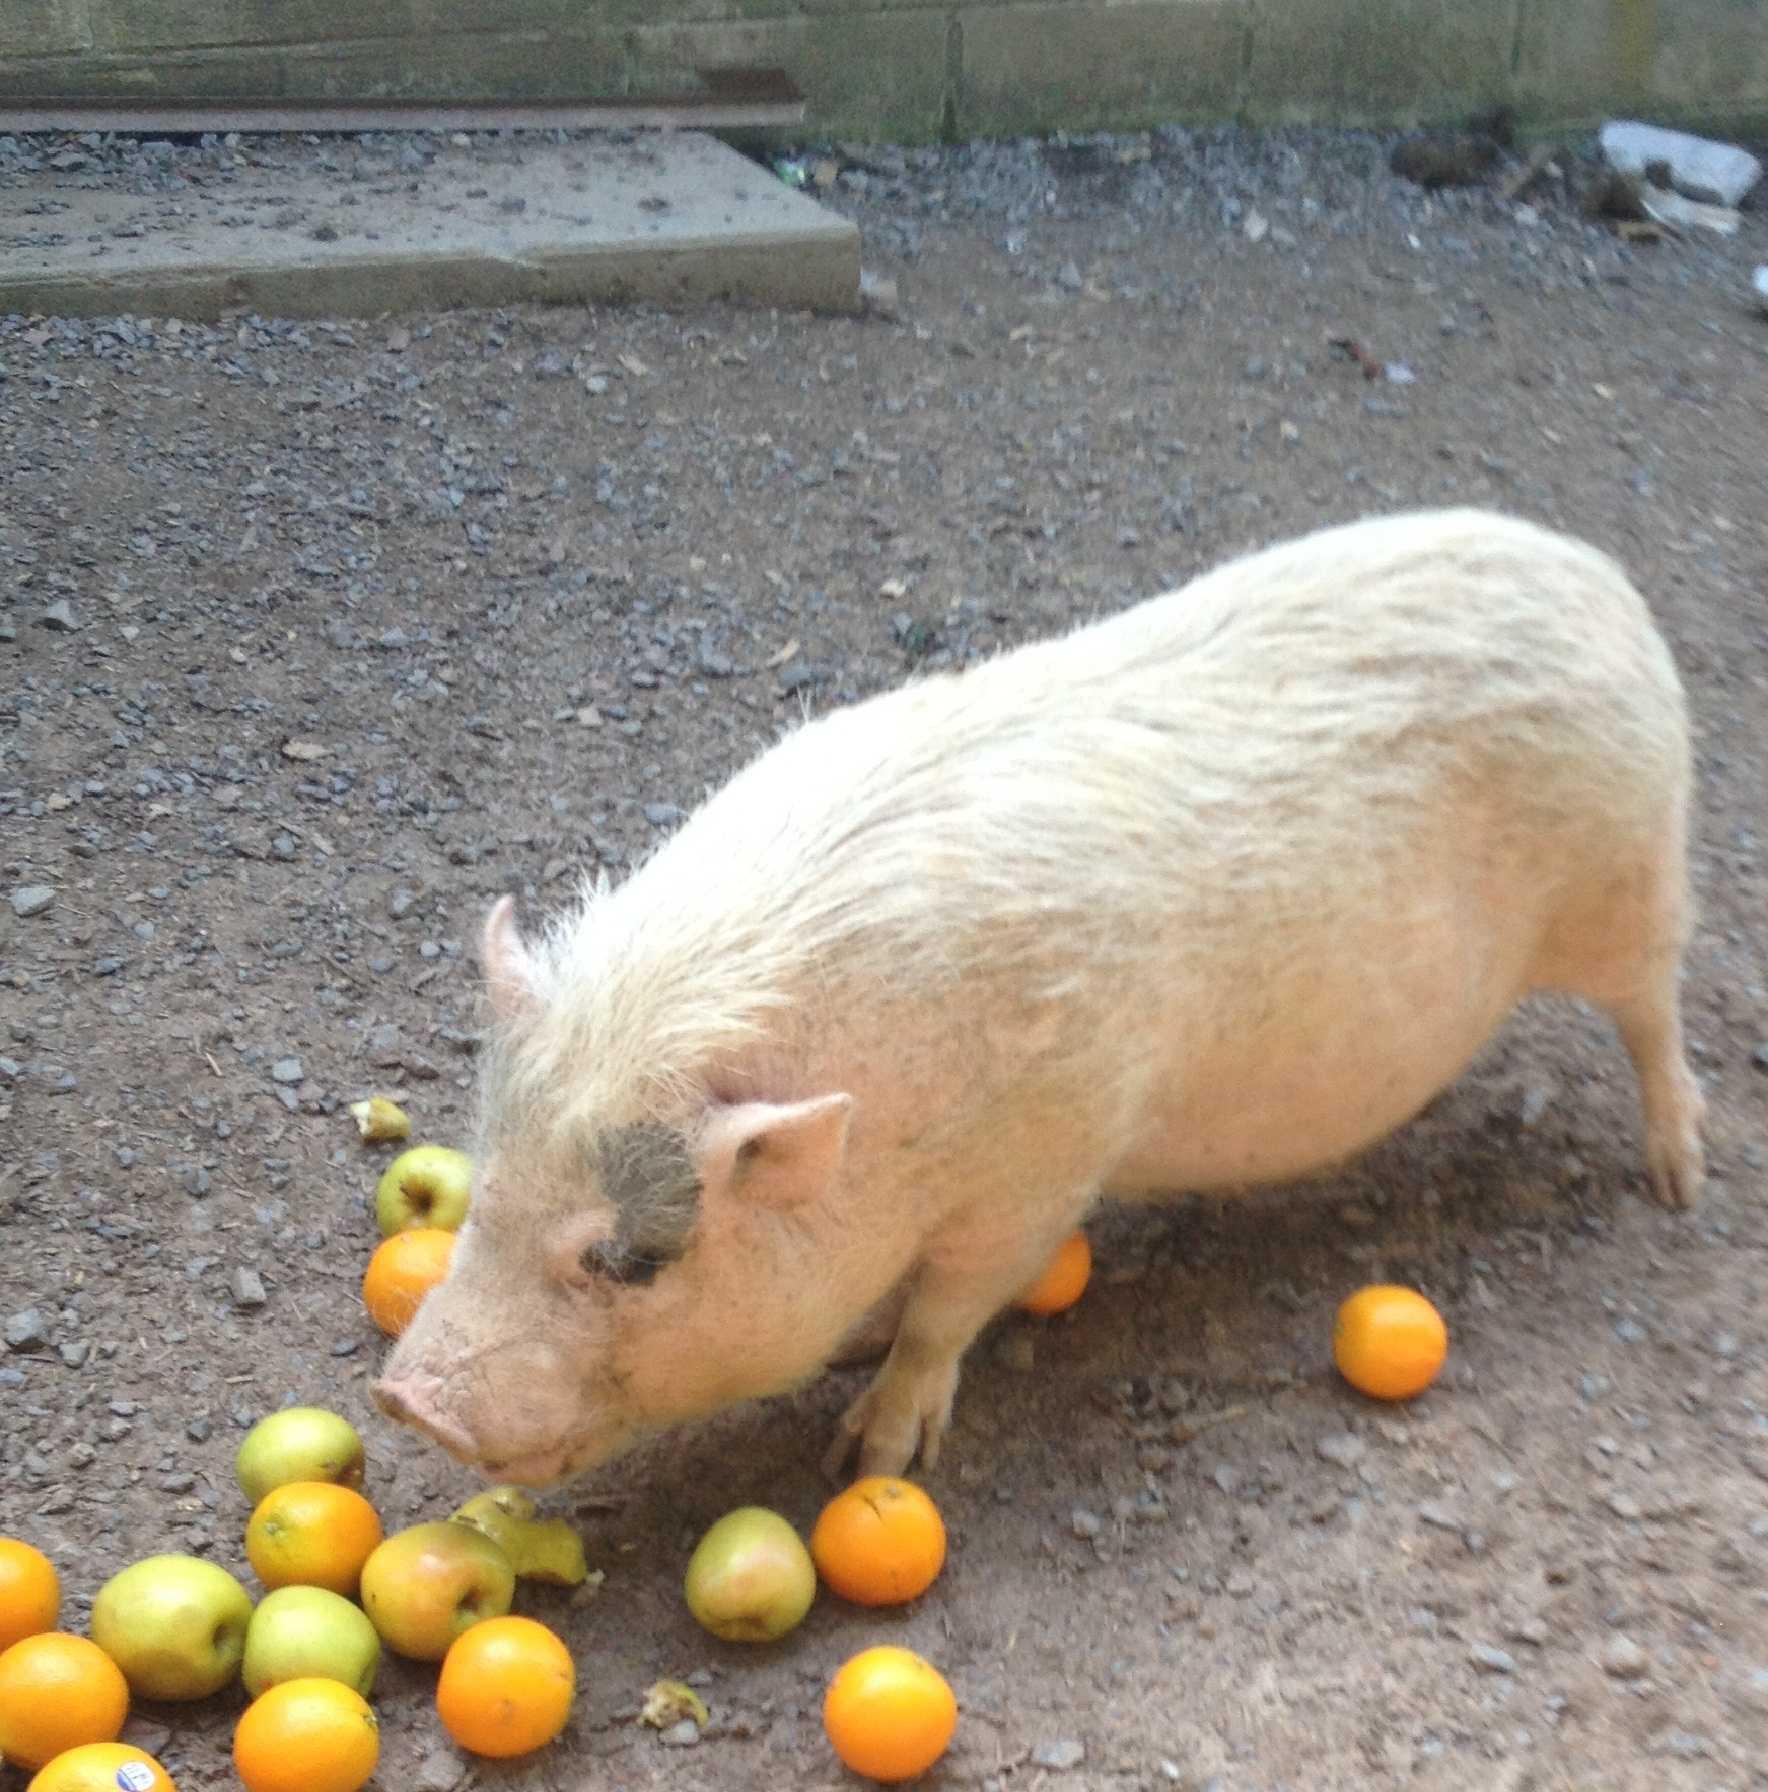 Karen Burall's pig, Emily, enjoys a tasty treat of apples and oranges.